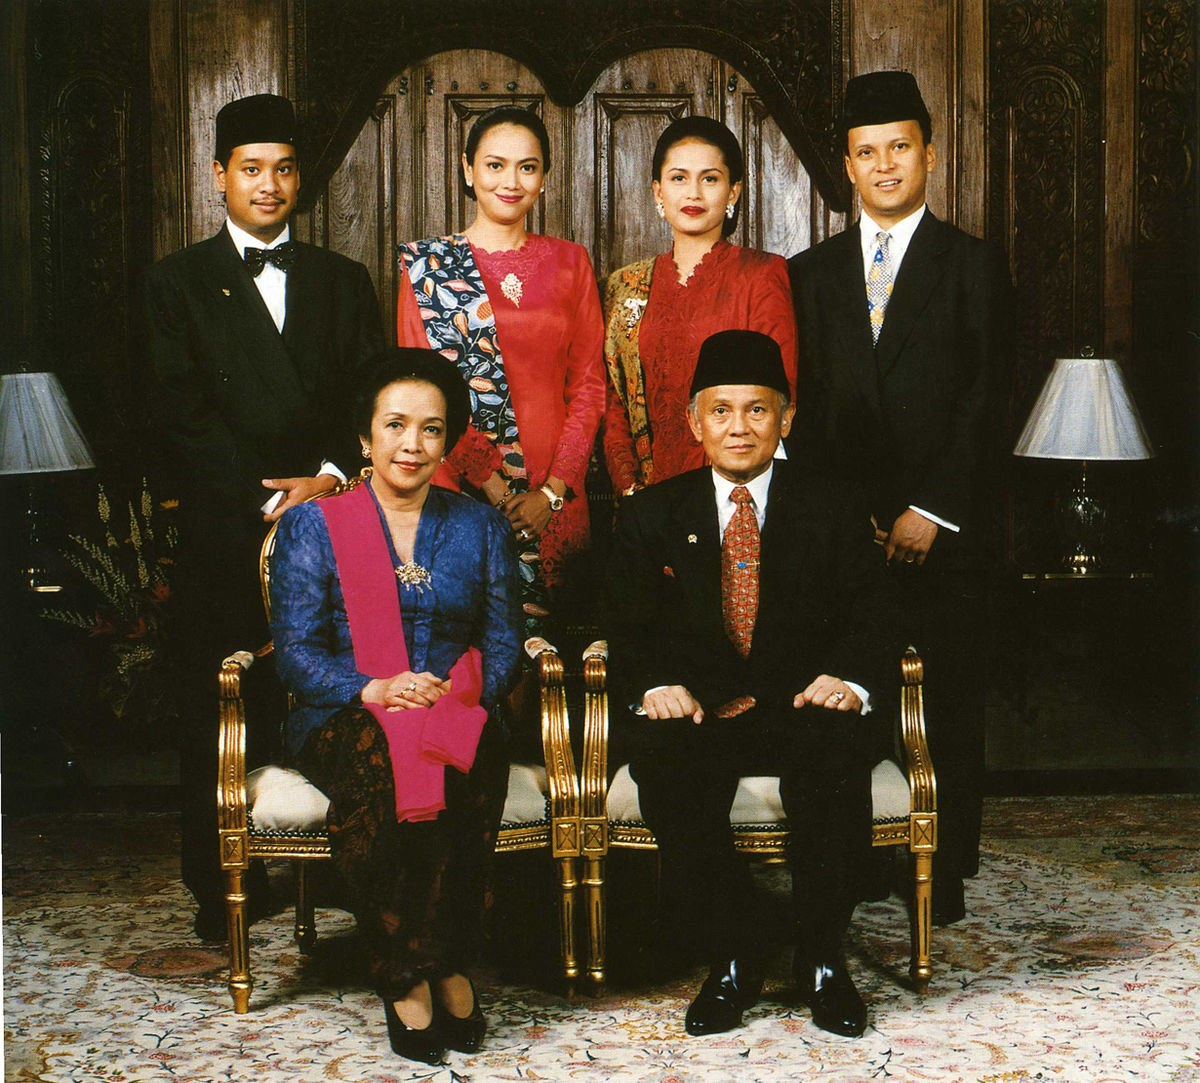 Design Baju Pengantin Pria Muslim Ipdd National Costume Of Indonesia